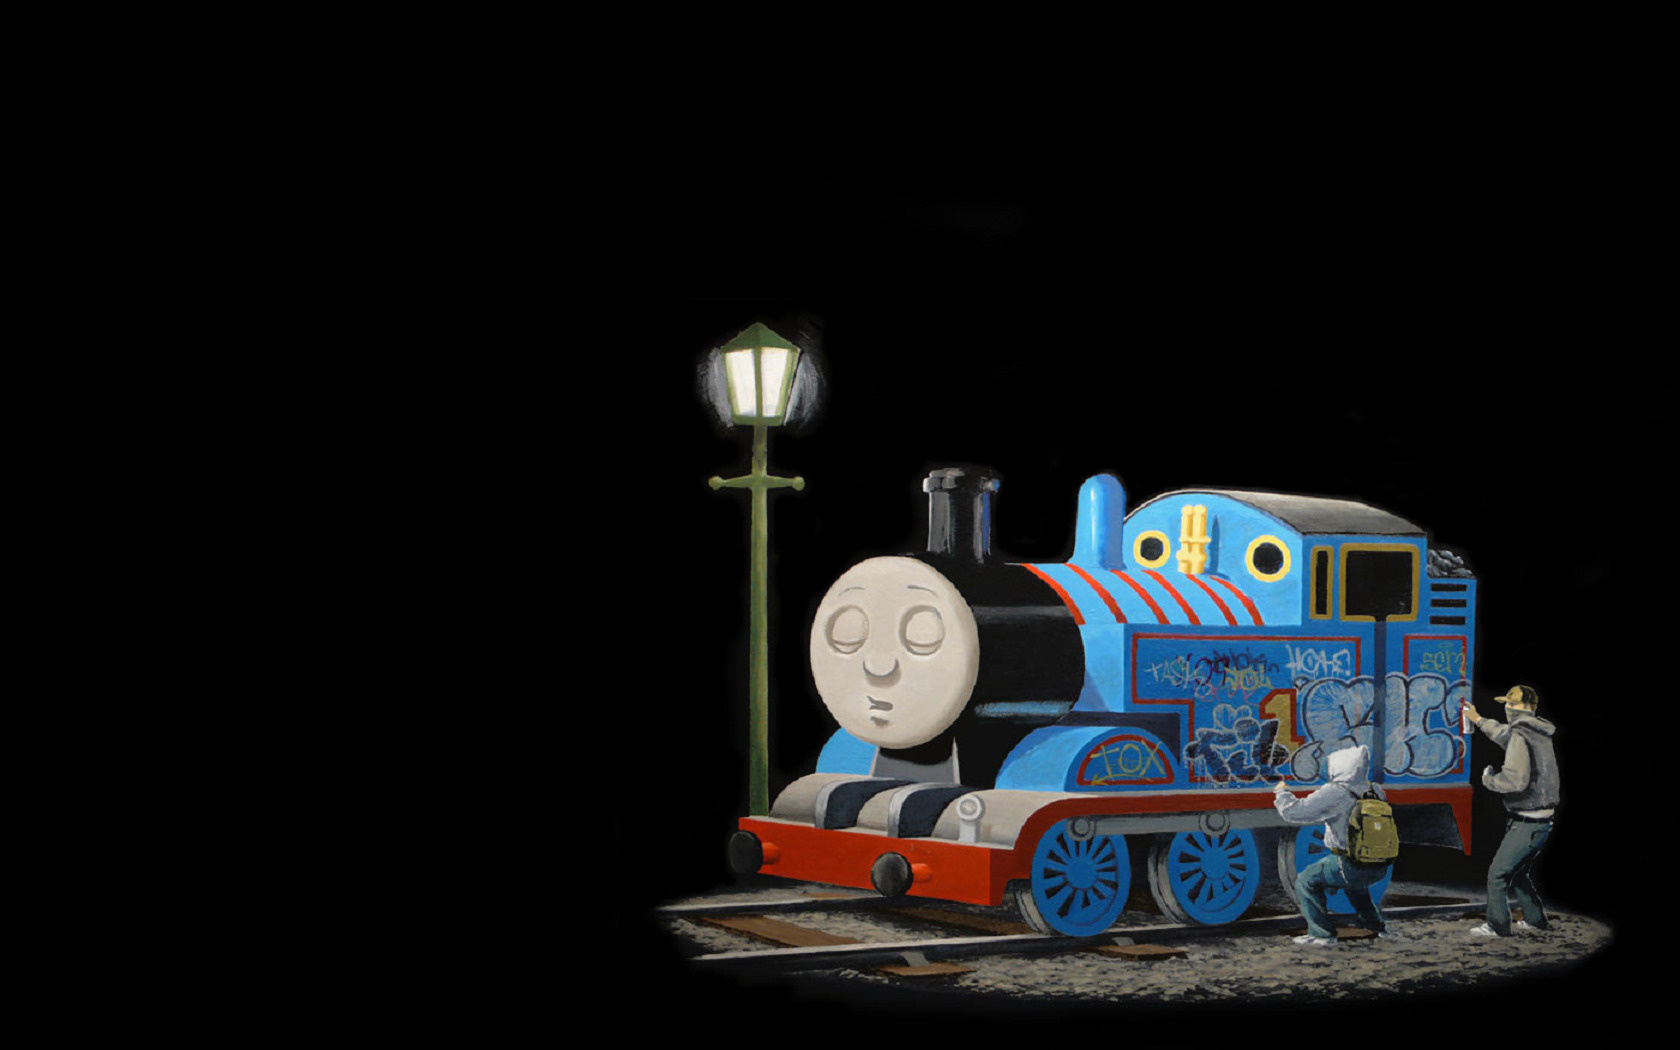 Friends Thomas the Tank Engine and Friends desktop wallpaper 3D 1680x1050